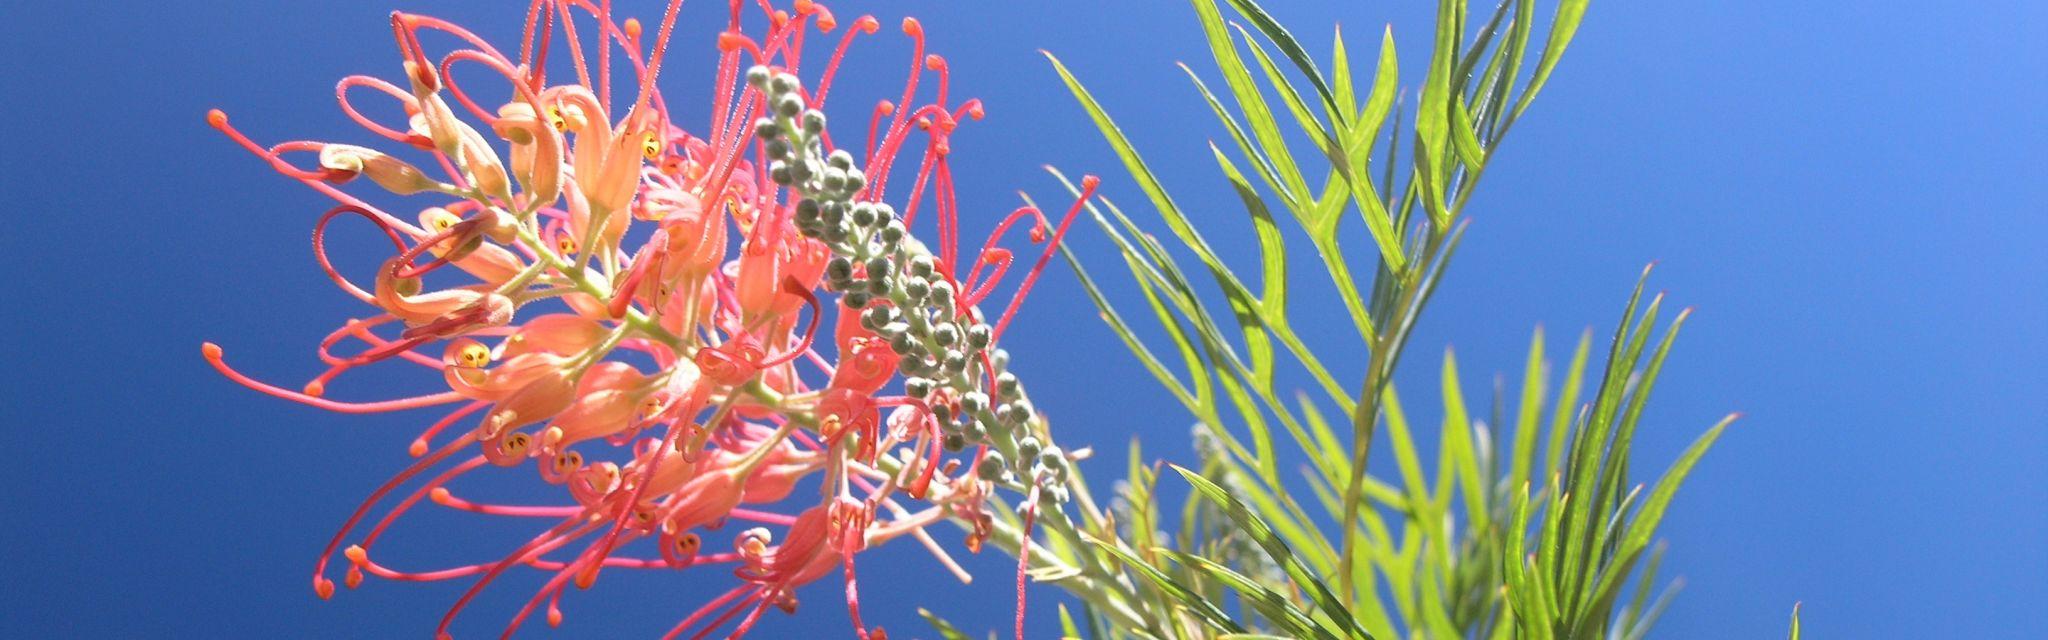 Red Grevillea unique flora in understanding about Australia